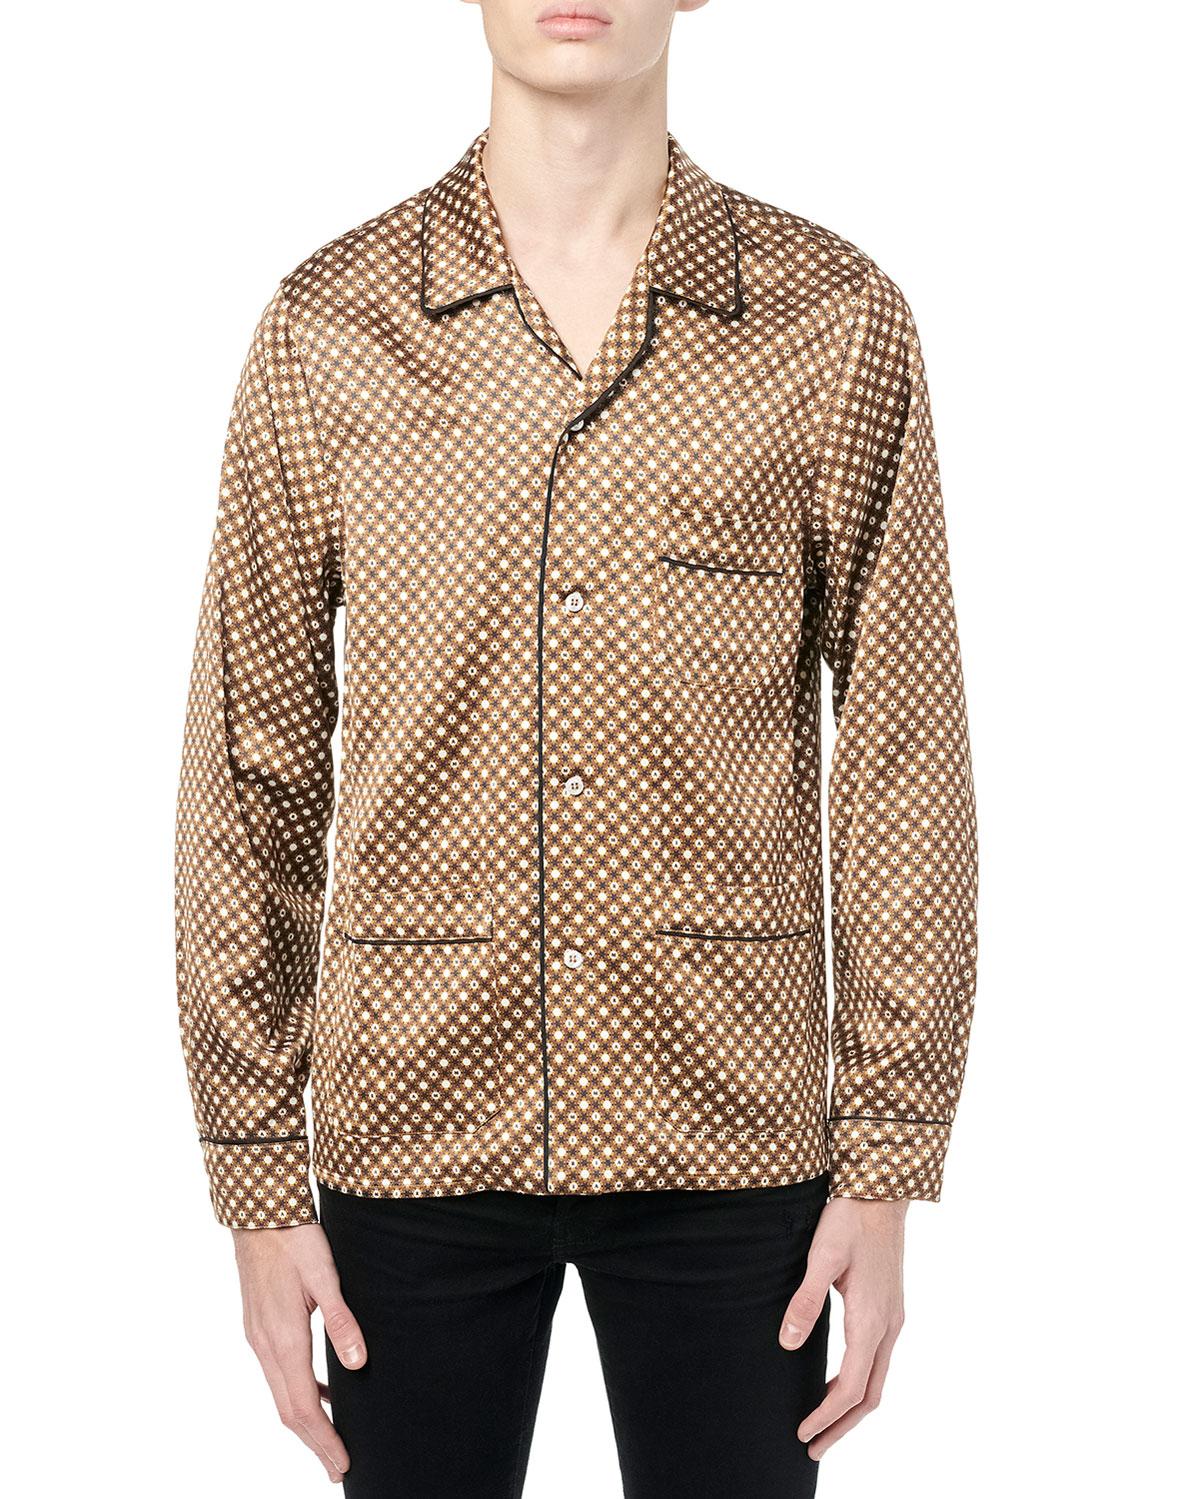 Men's Poker-Print Pajama Shirt